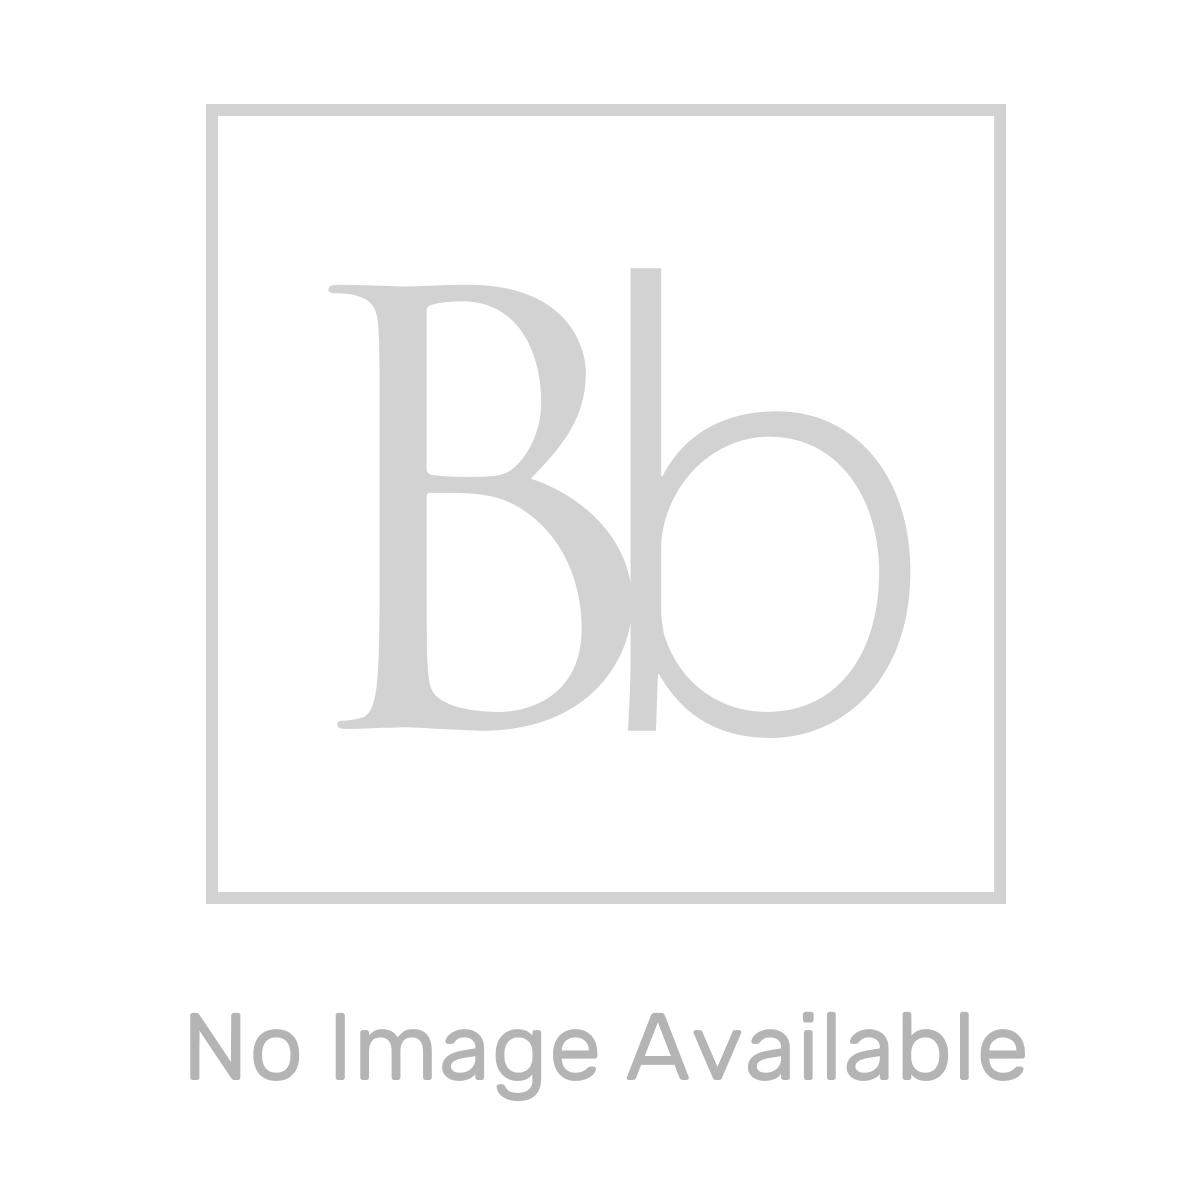 Frontline Aquaglass+ Double Folding Bath Screen Detail